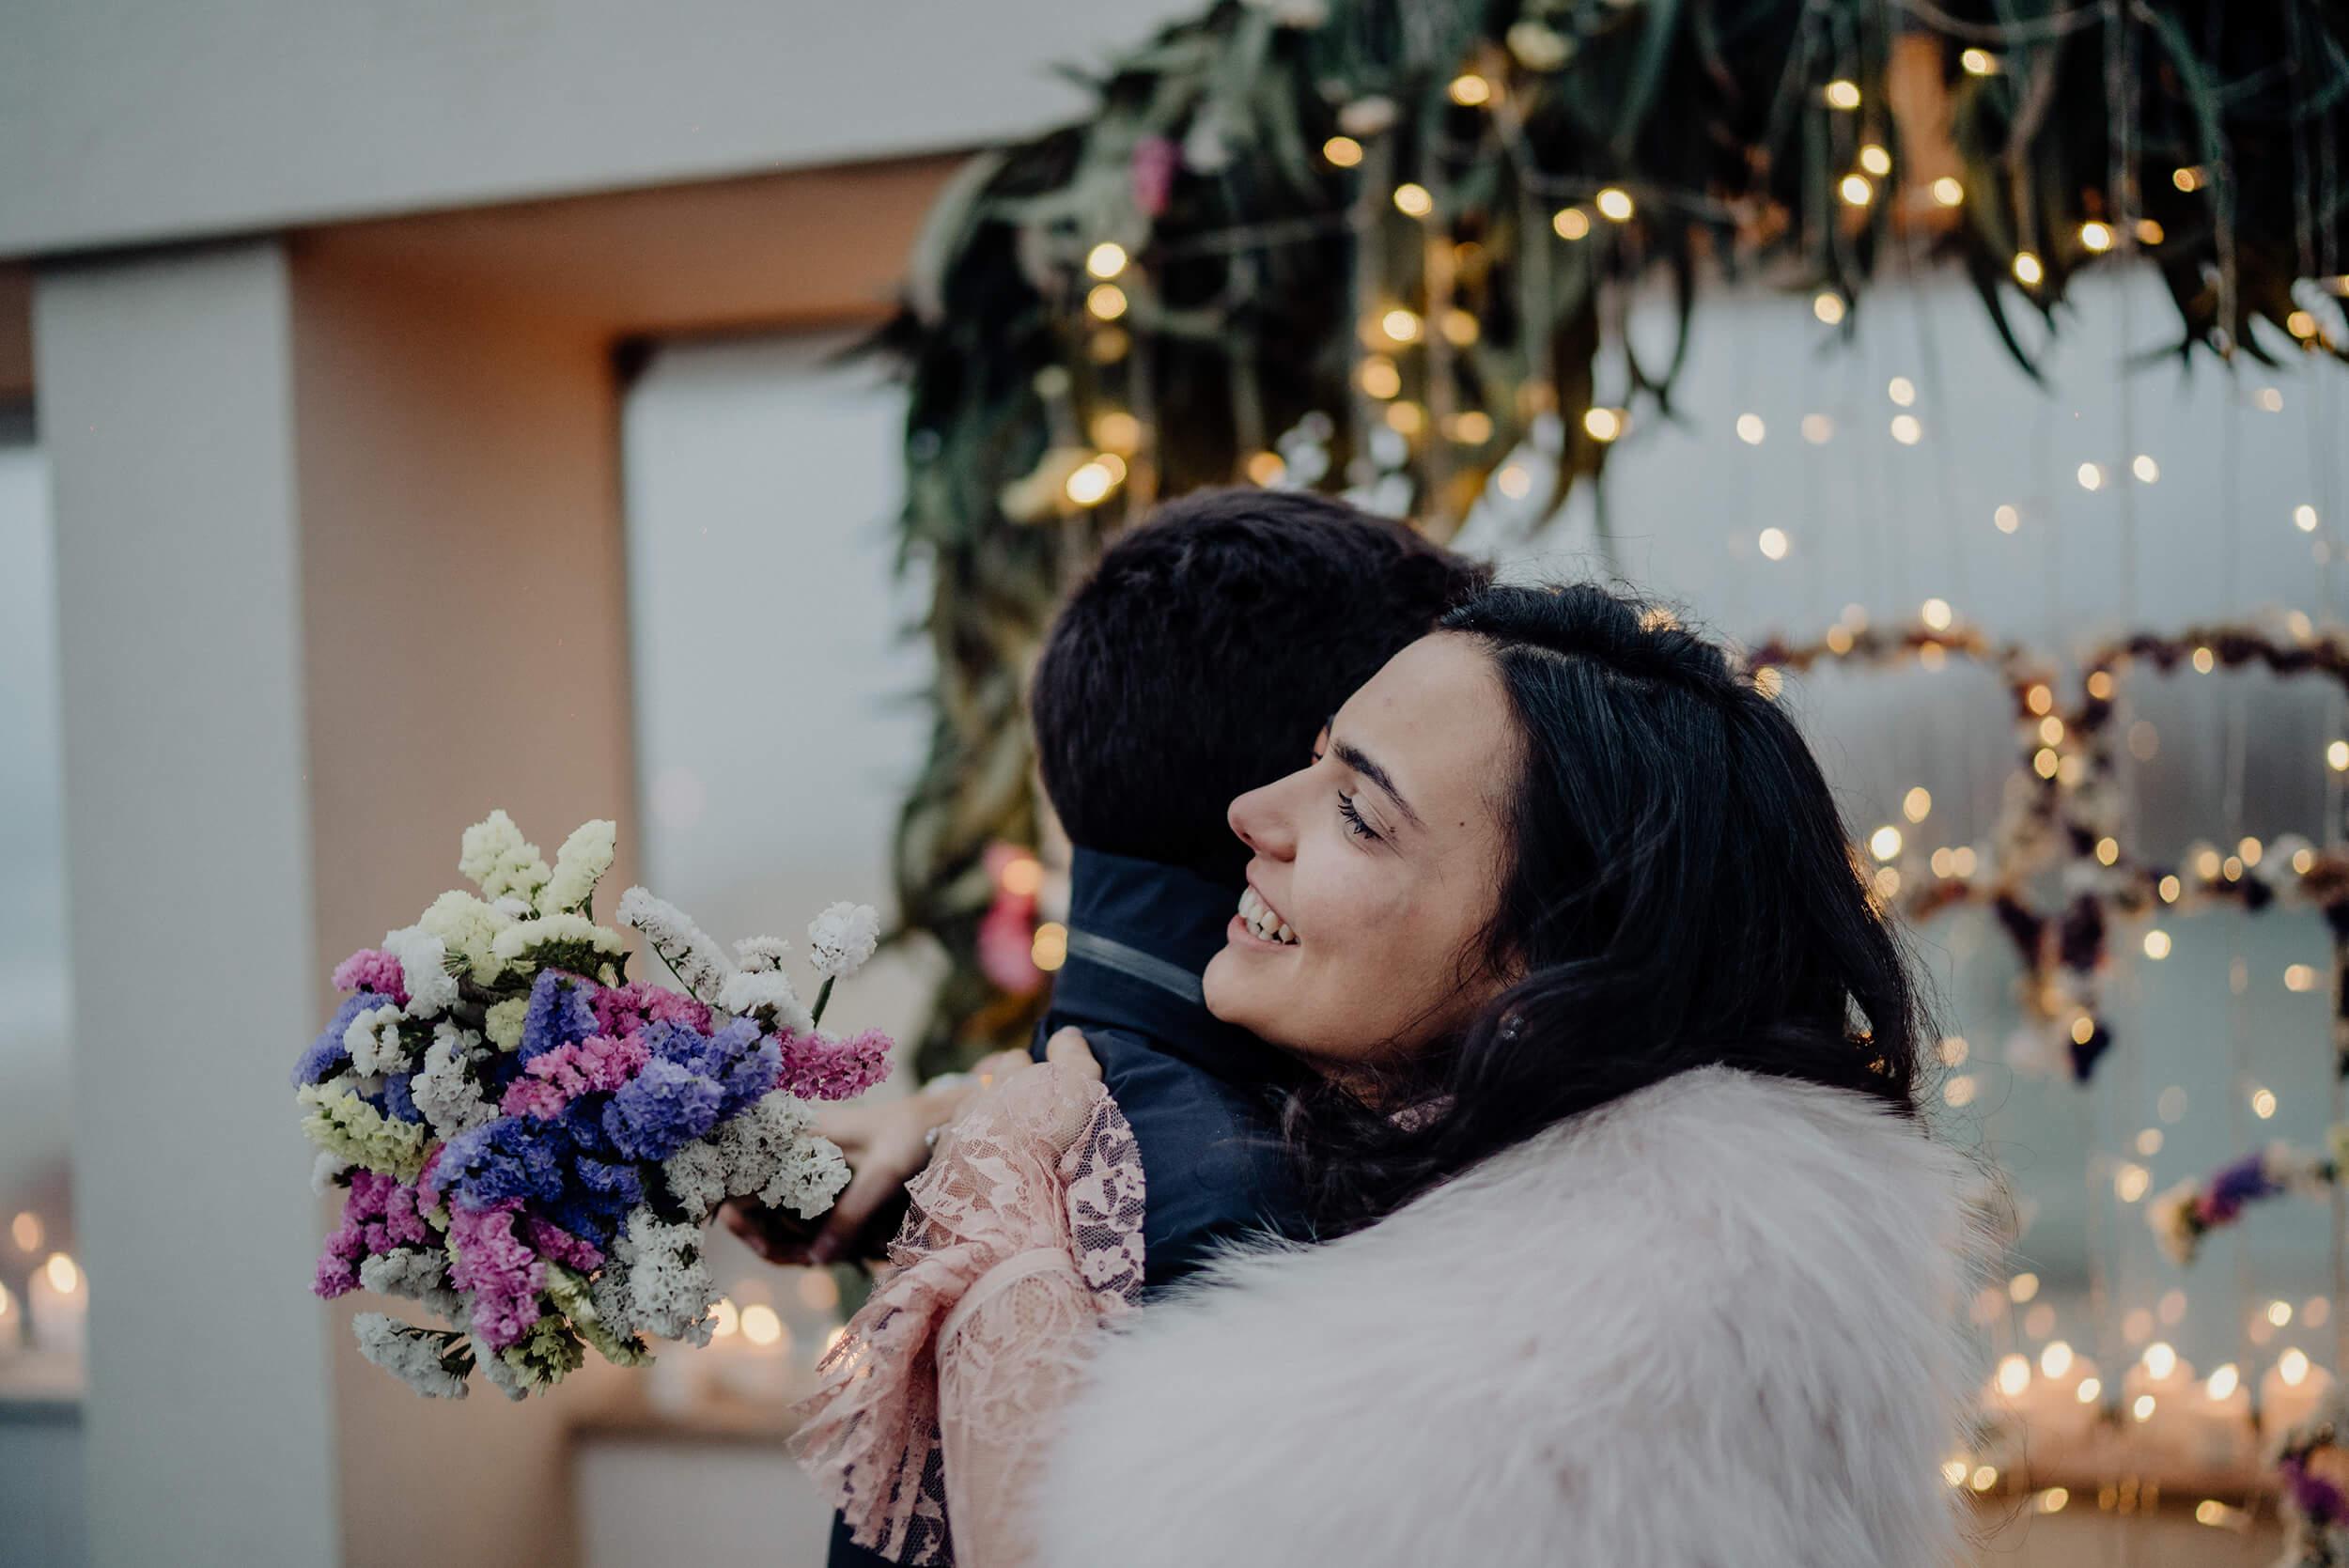 roma-organizacao-eventos-pedido-de-casamento-no-porto-36